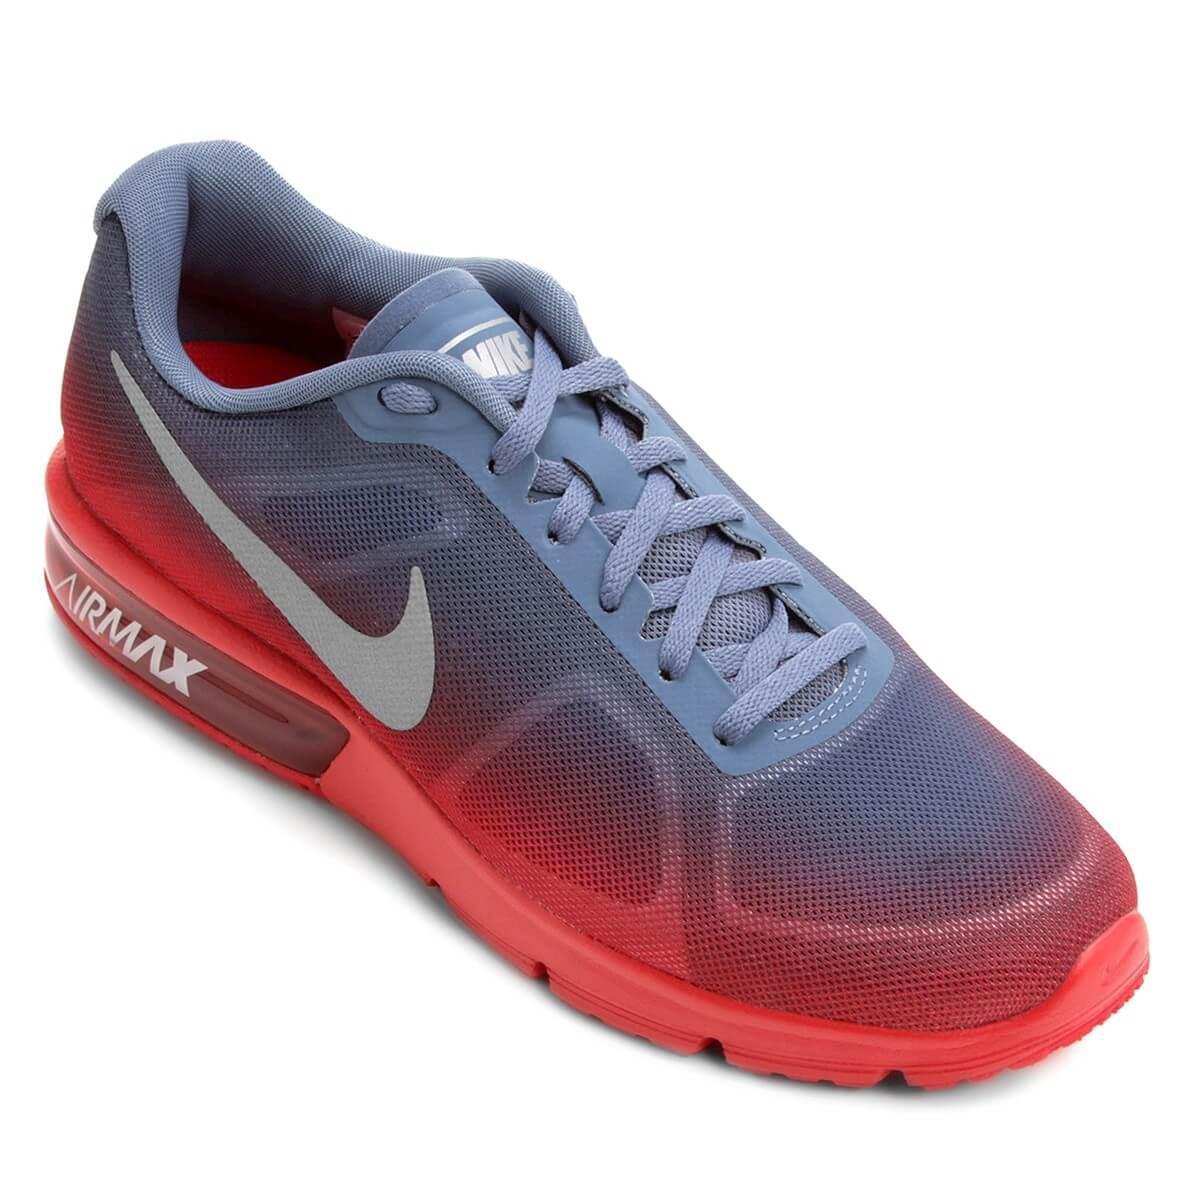 size 40 f6f56 62d05 Tênis Nike Air Max Sequent Masculino